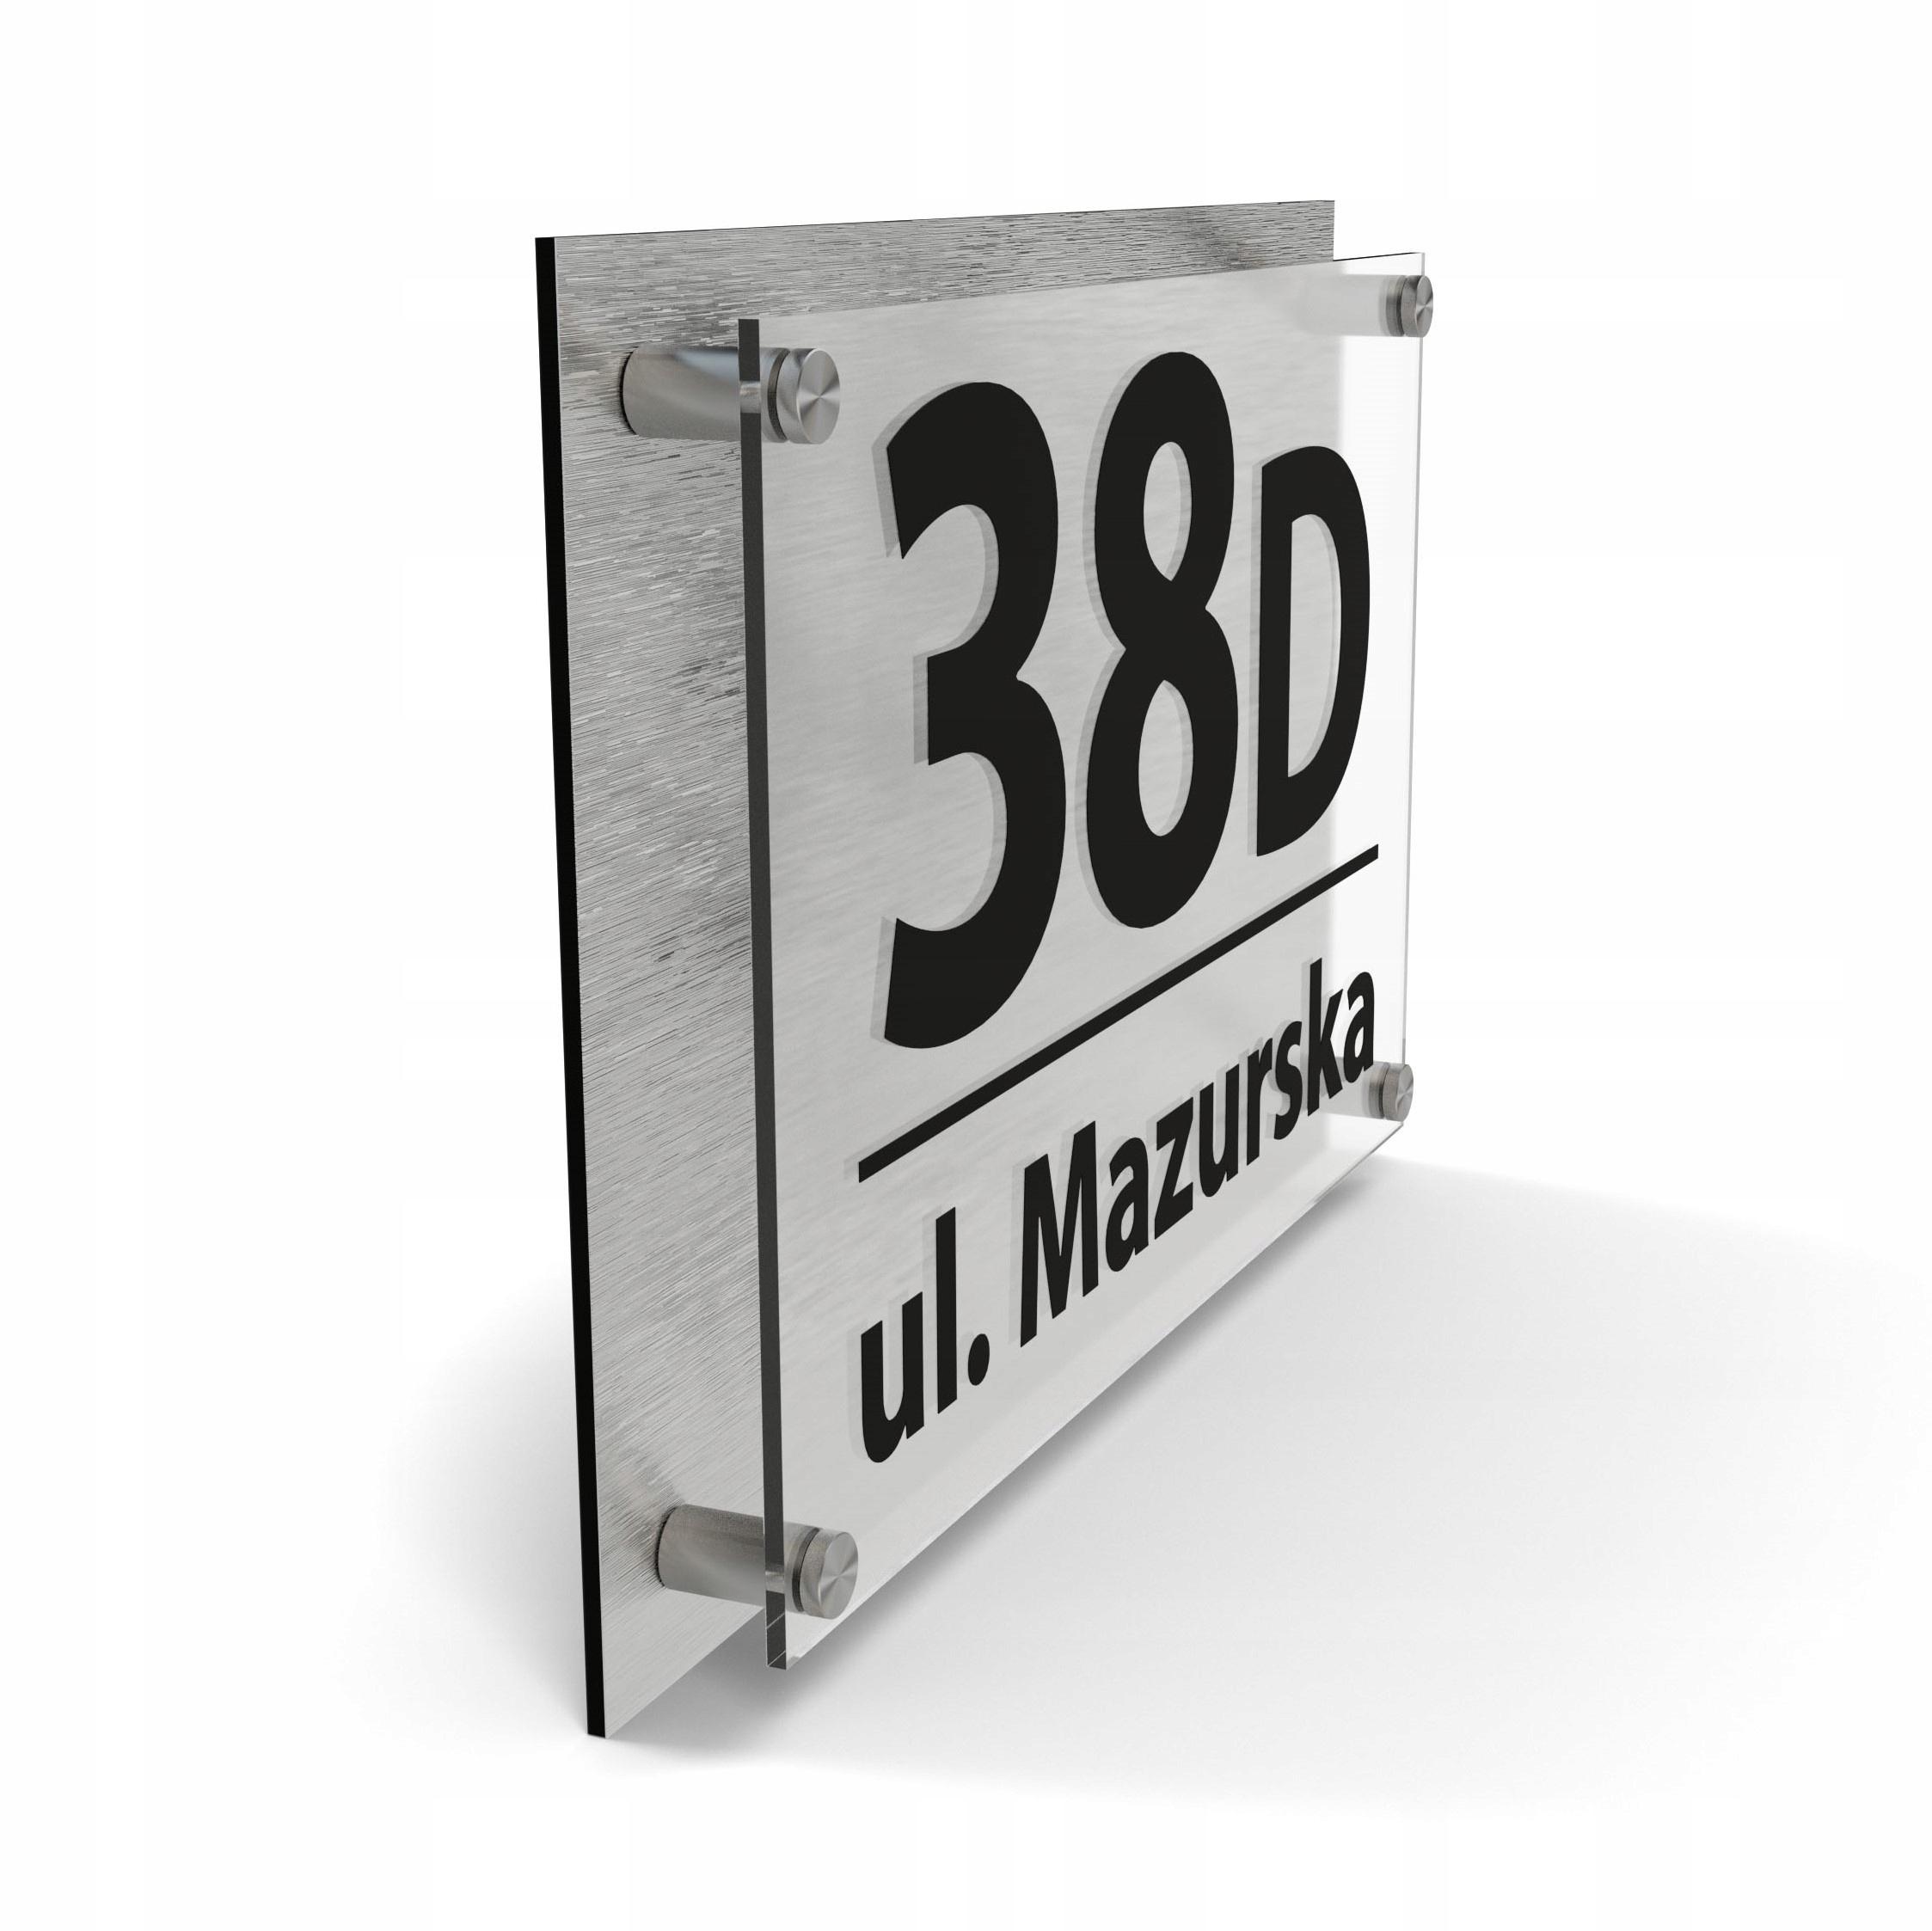 Адресная табличка номер дома 30х20 3D - ЦВЕТА